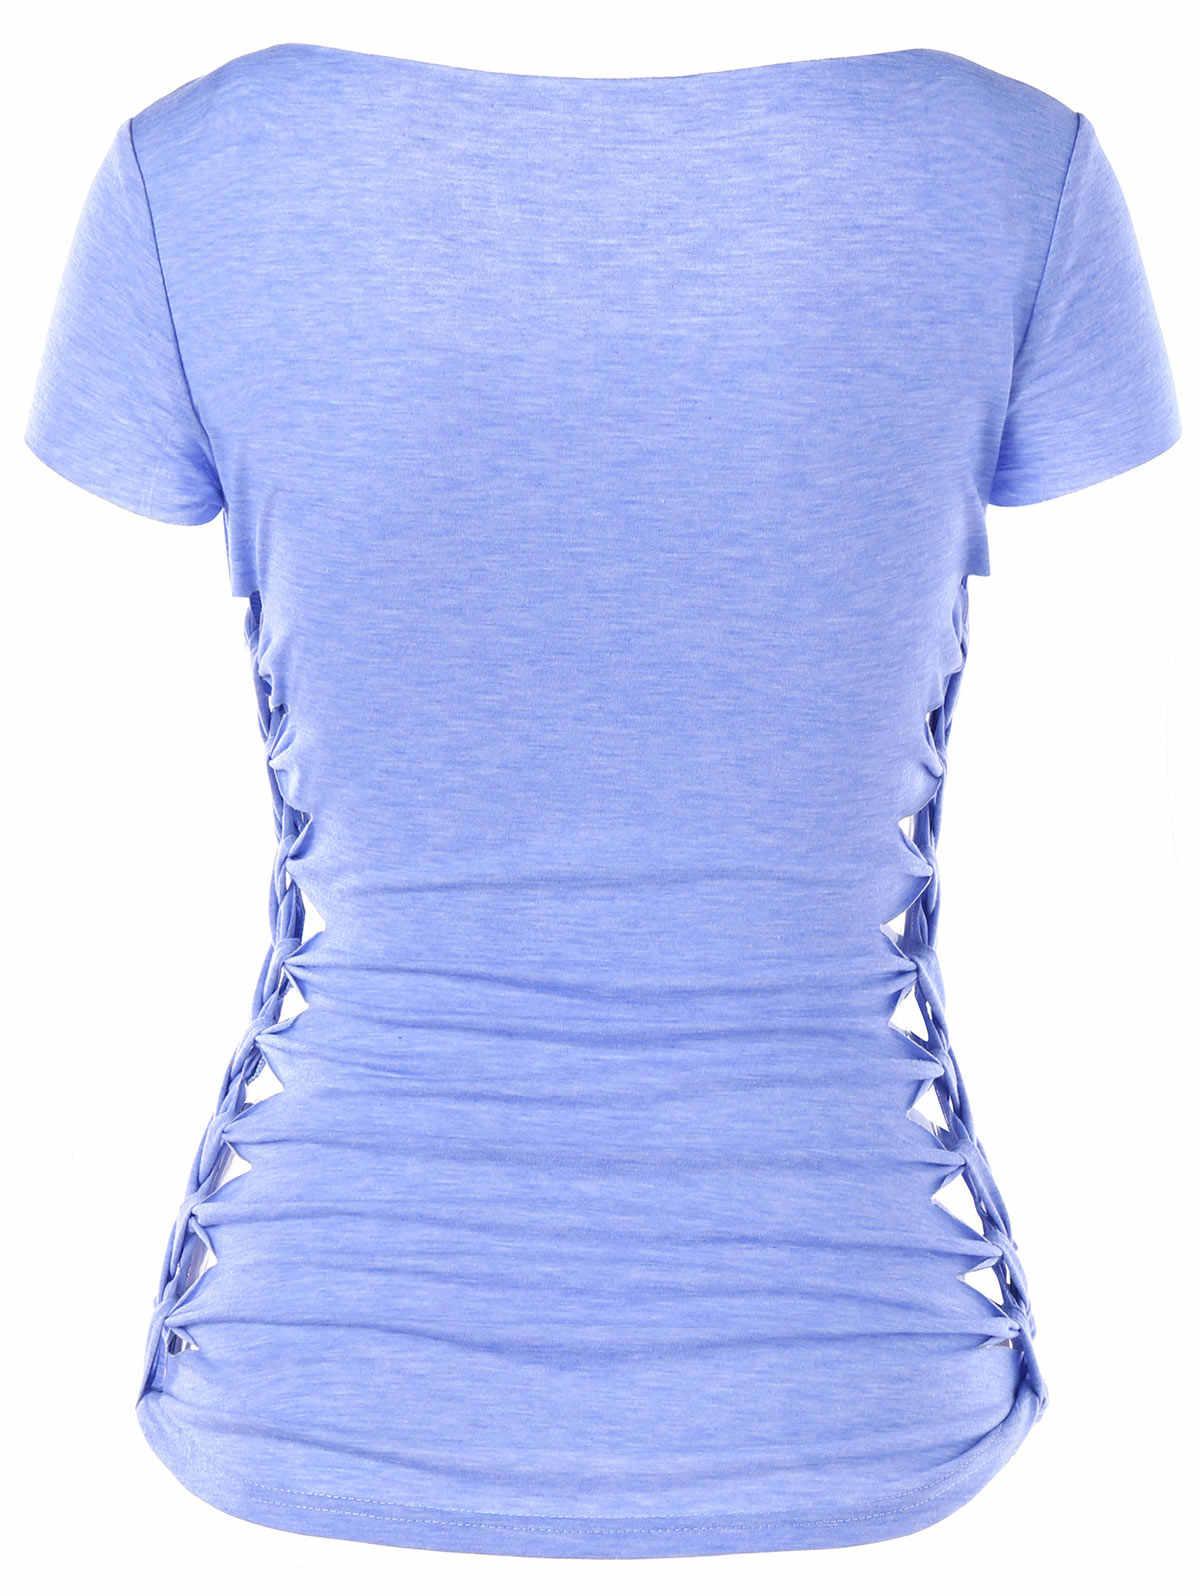 24272e2b6c1c ... Gamiss Skull Print Braided Shredding T-Shirt Women Summer Casual Square  Neck Short Sleeve Graphic ...